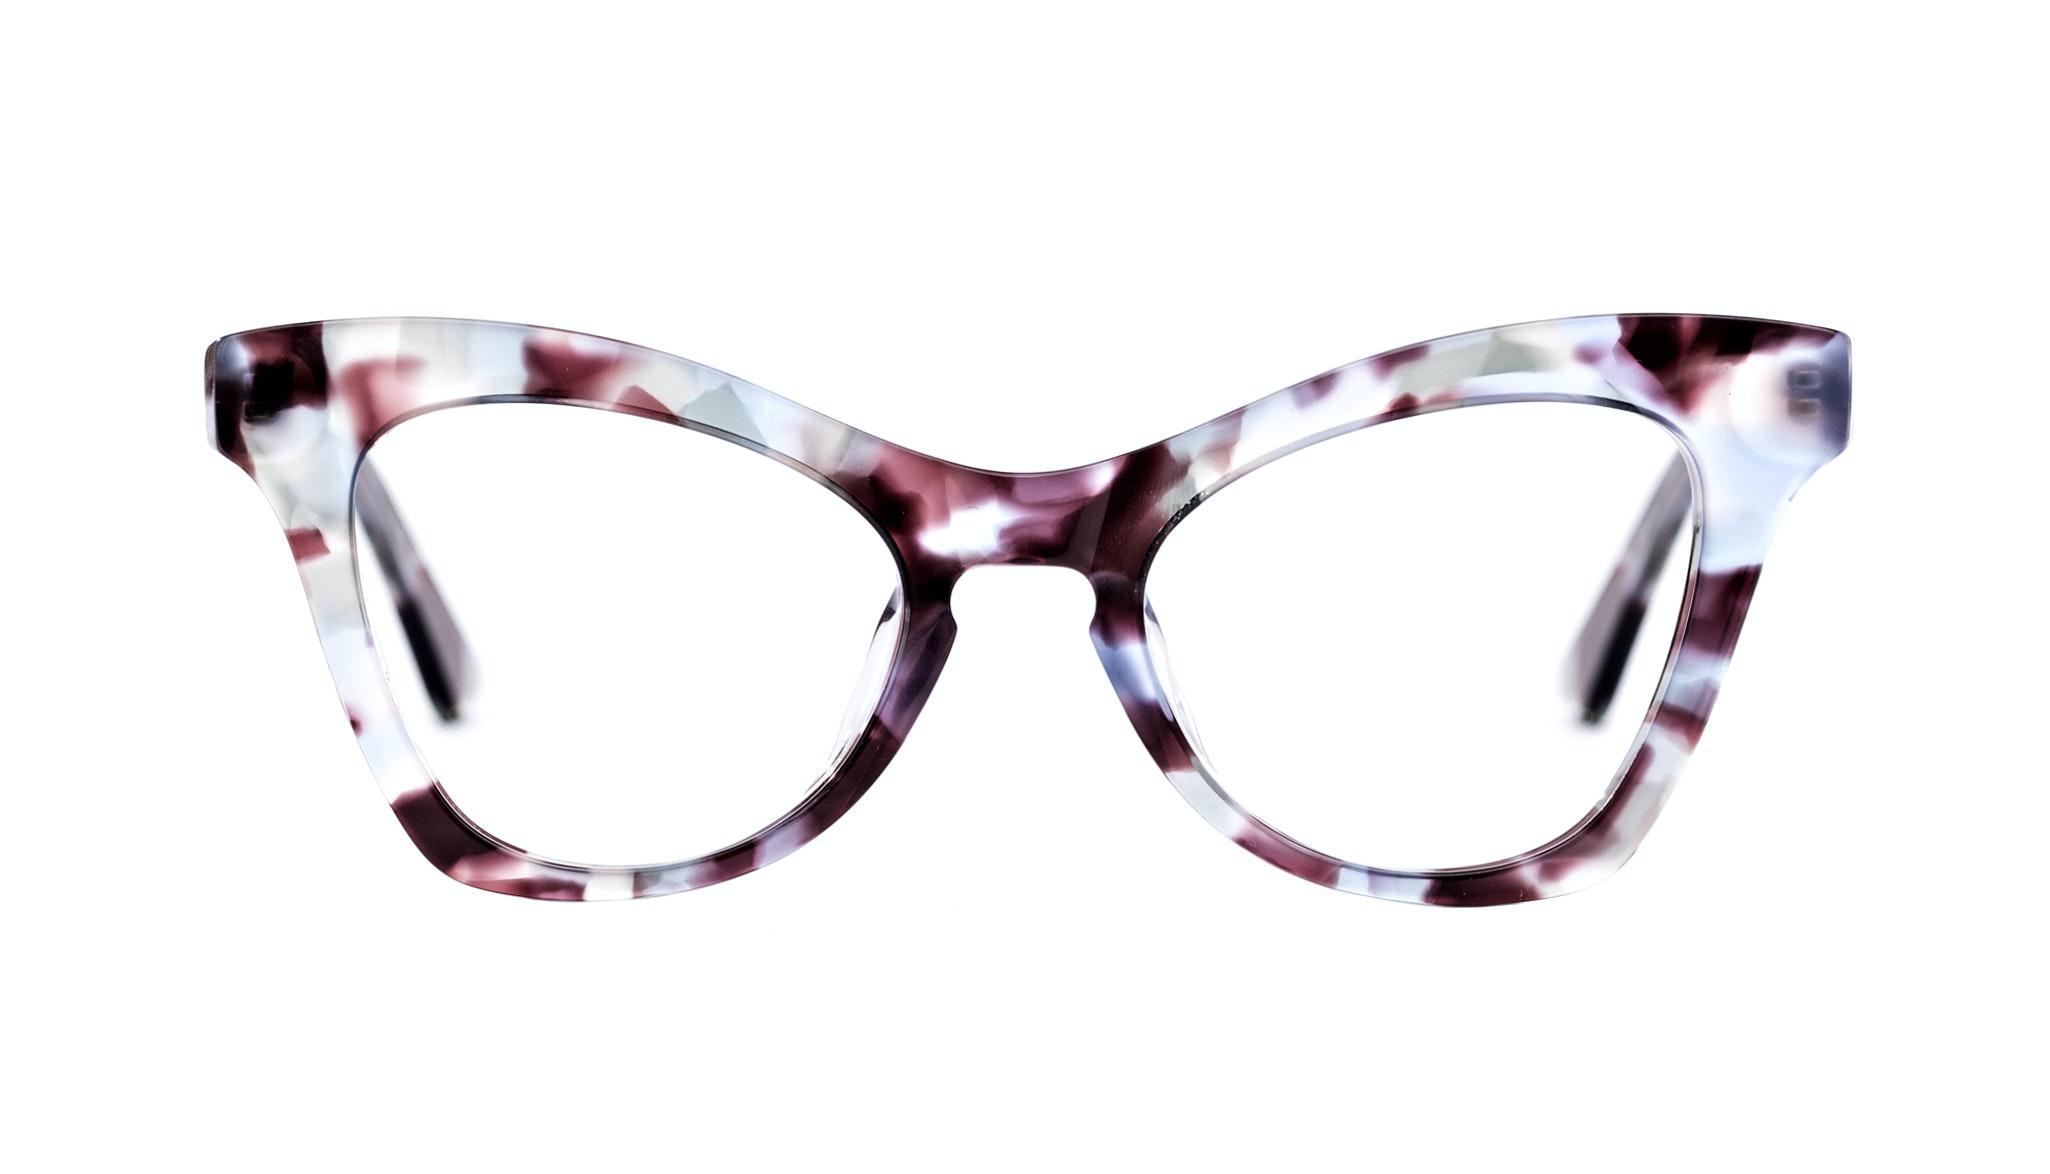 Affordable Fashion Glasses Cat Eye Eyeglasses Women Divine Lilac Tort